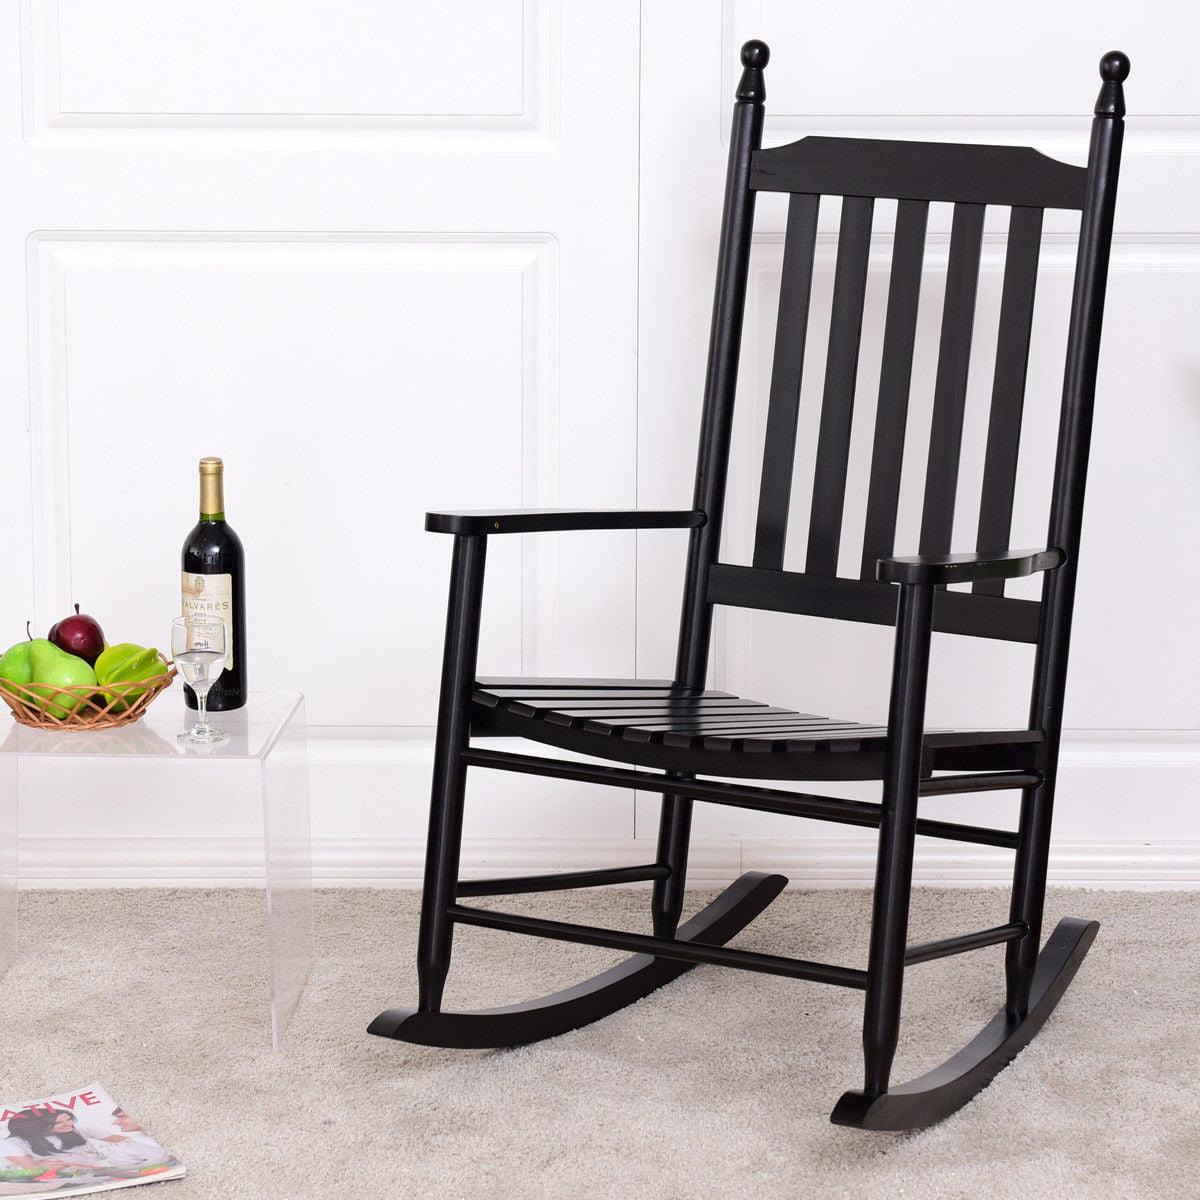 Gymax Wooden Rocking Chair Porch Rocker Armchair Balcony Deck Garden Furniture Black - image 8 of 8